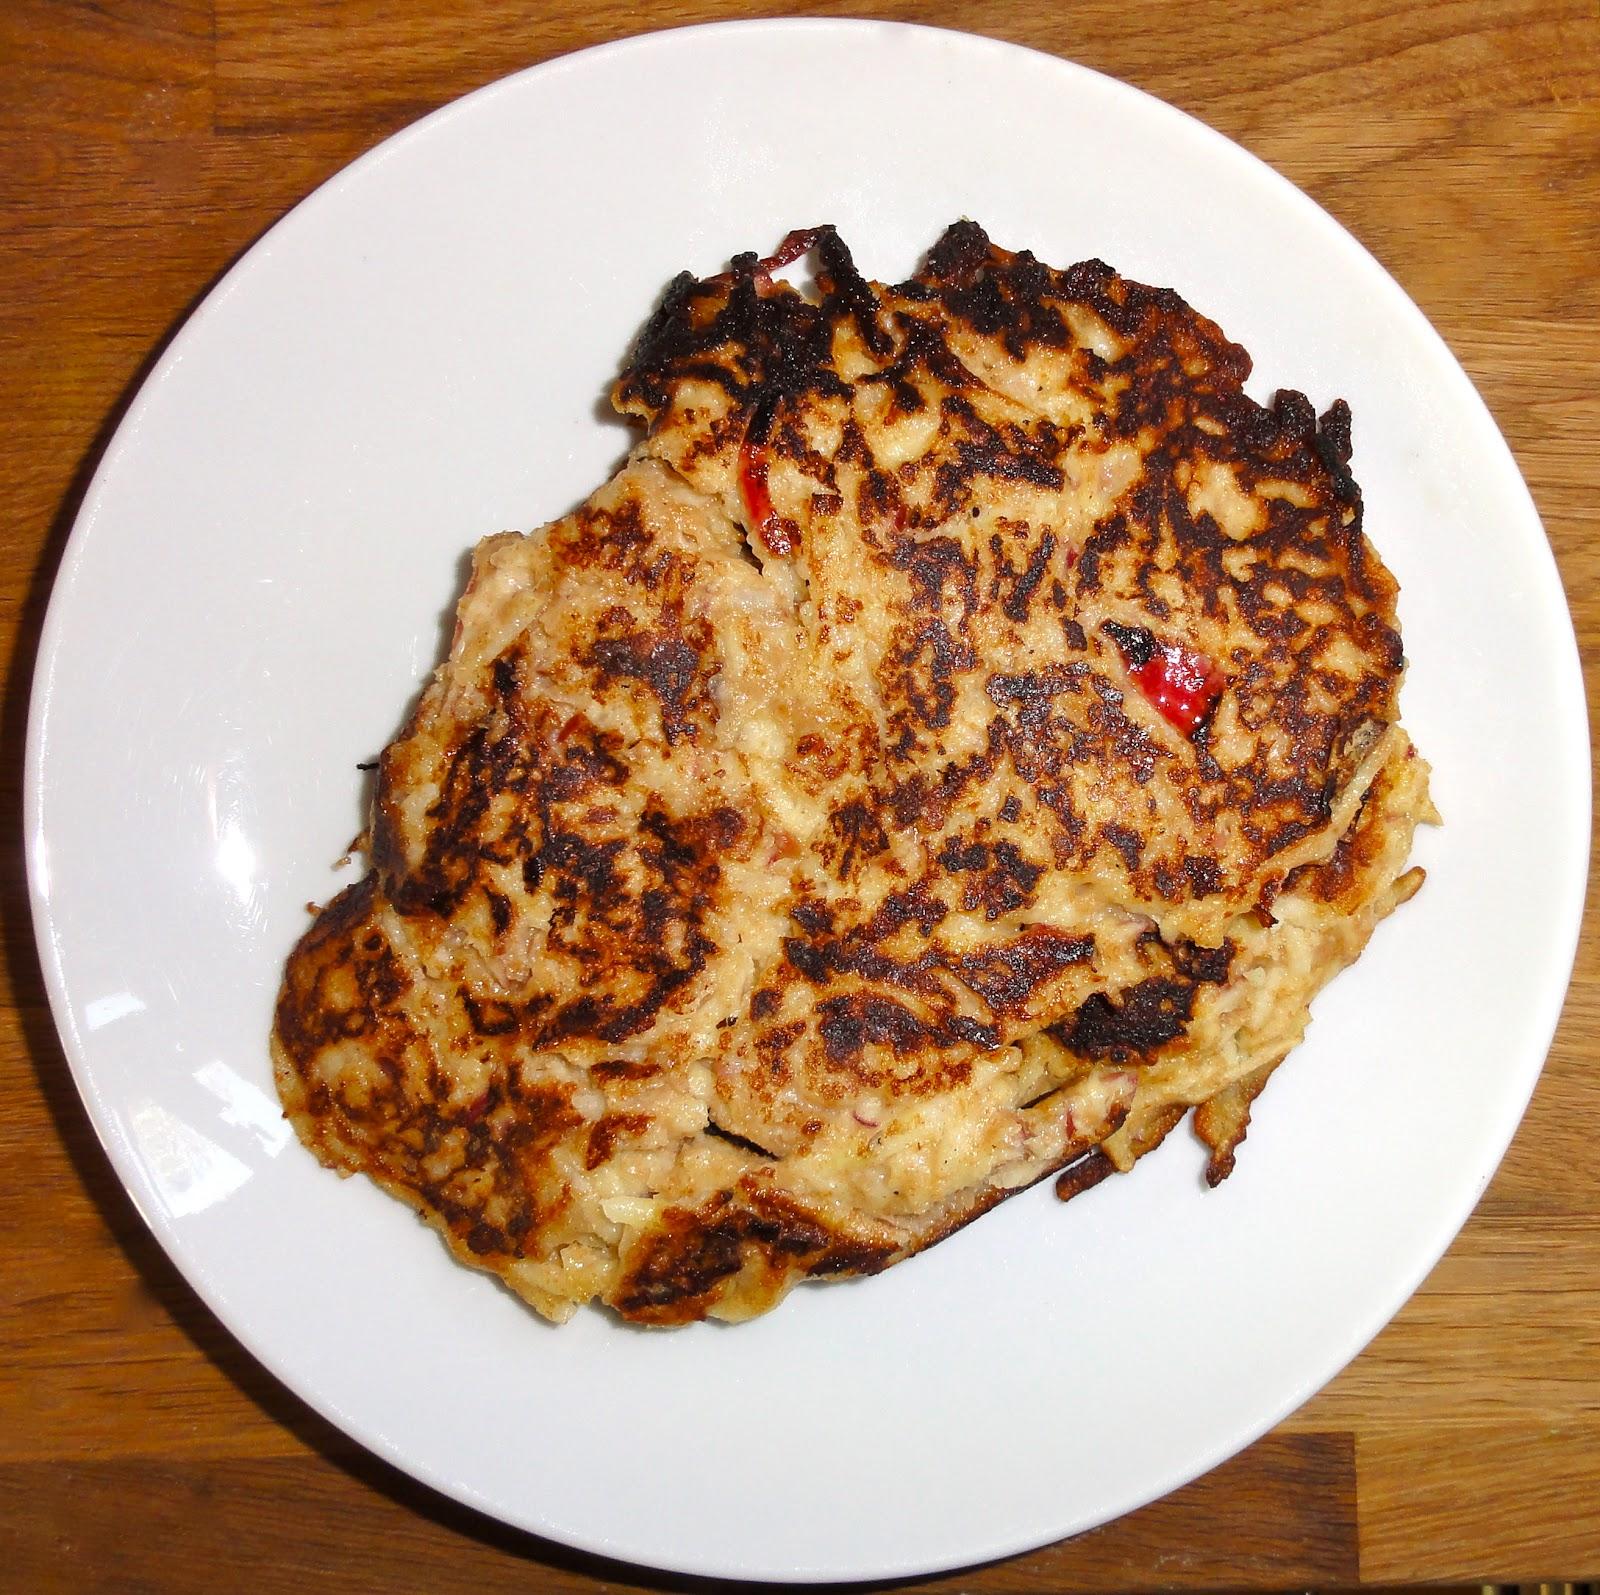 echte hausfrau apple pancake recipe apfelpfannkuchen